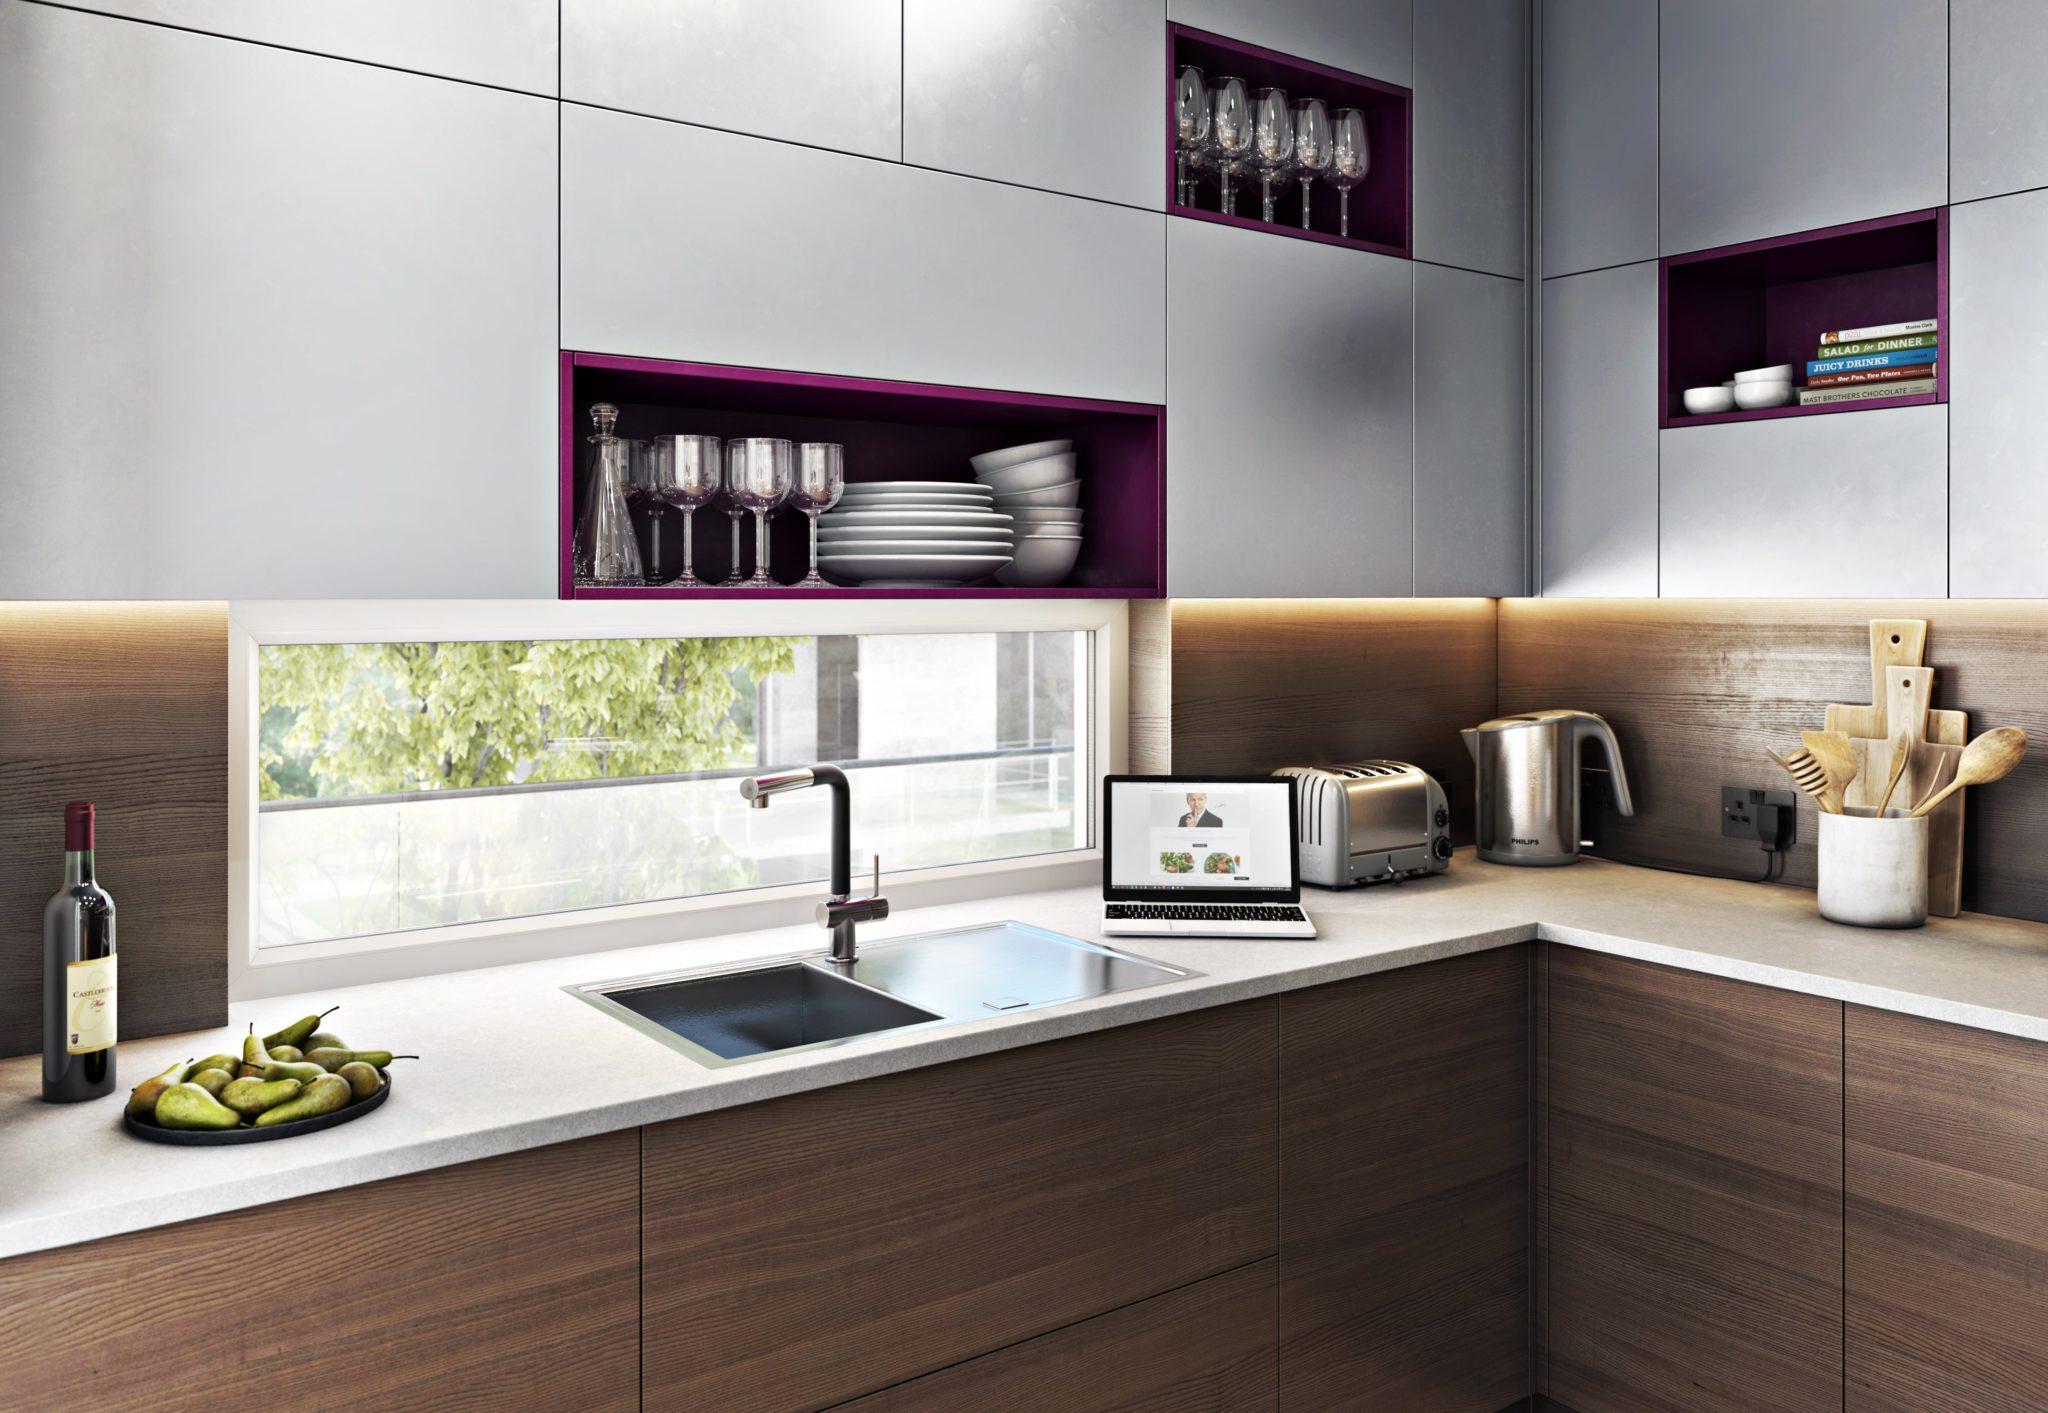 Kitchen Interior 3D Rendering for Ultimate Sophistication